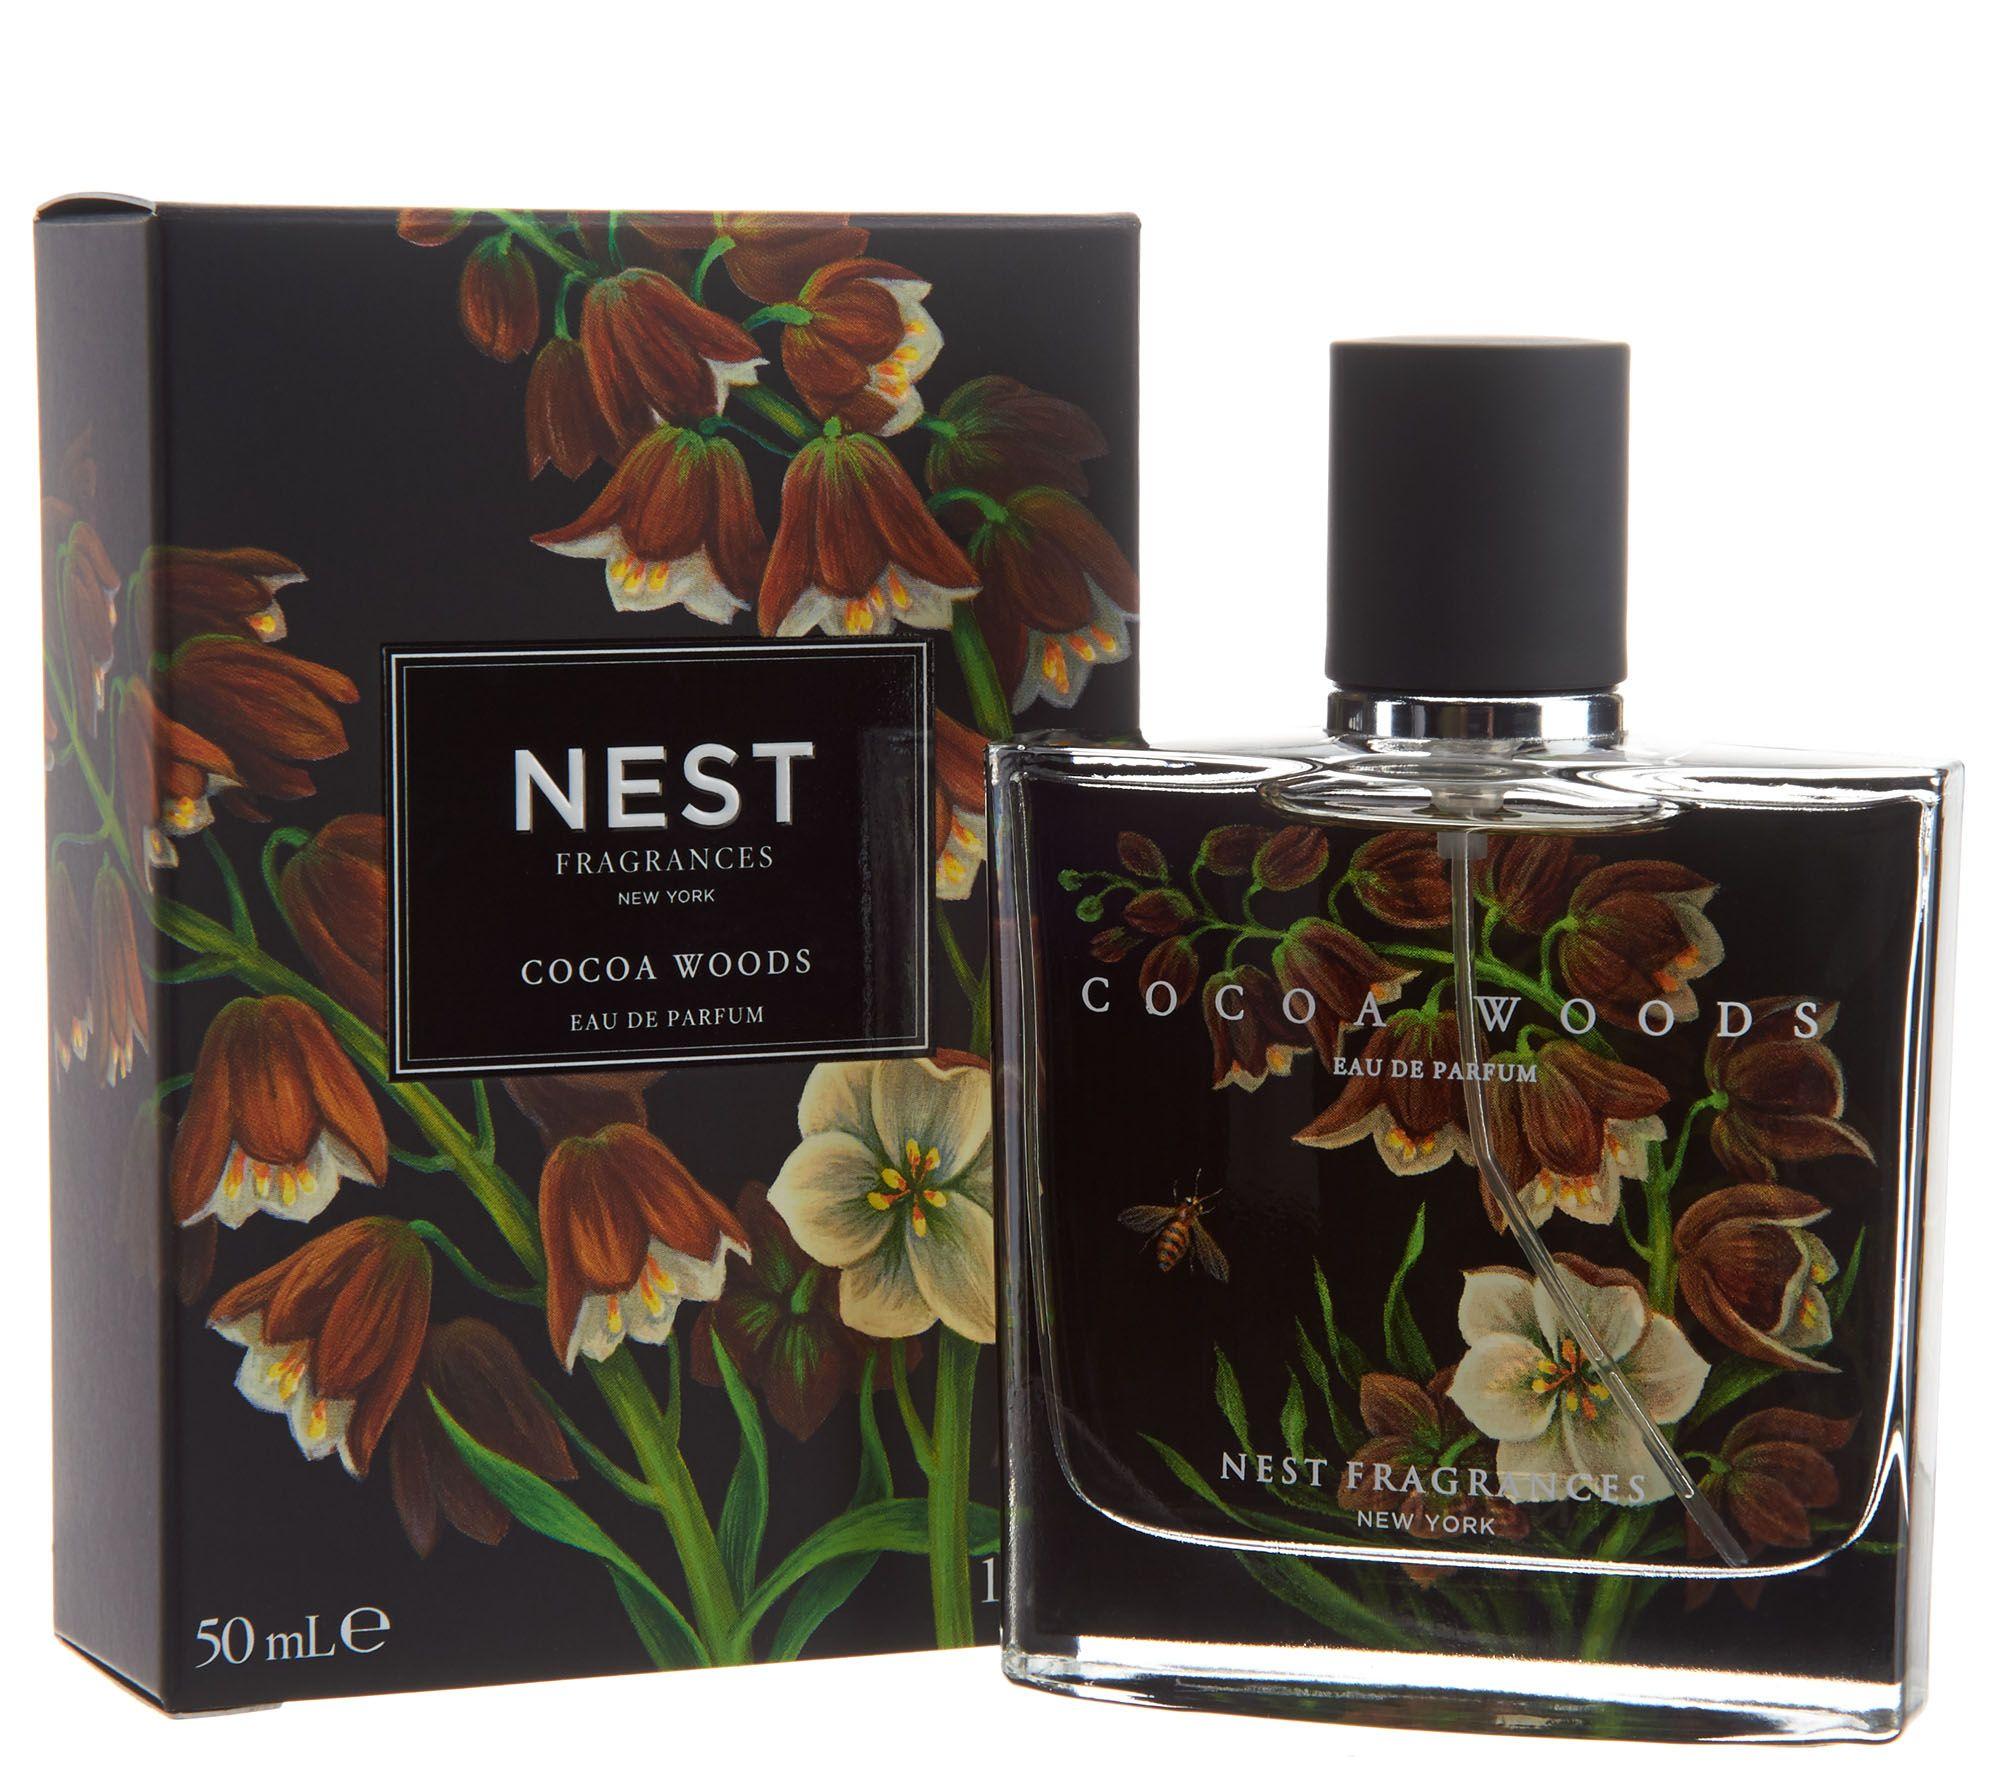 NEST Fragrances — Perfume, Body Cream, Scents — QVC.com